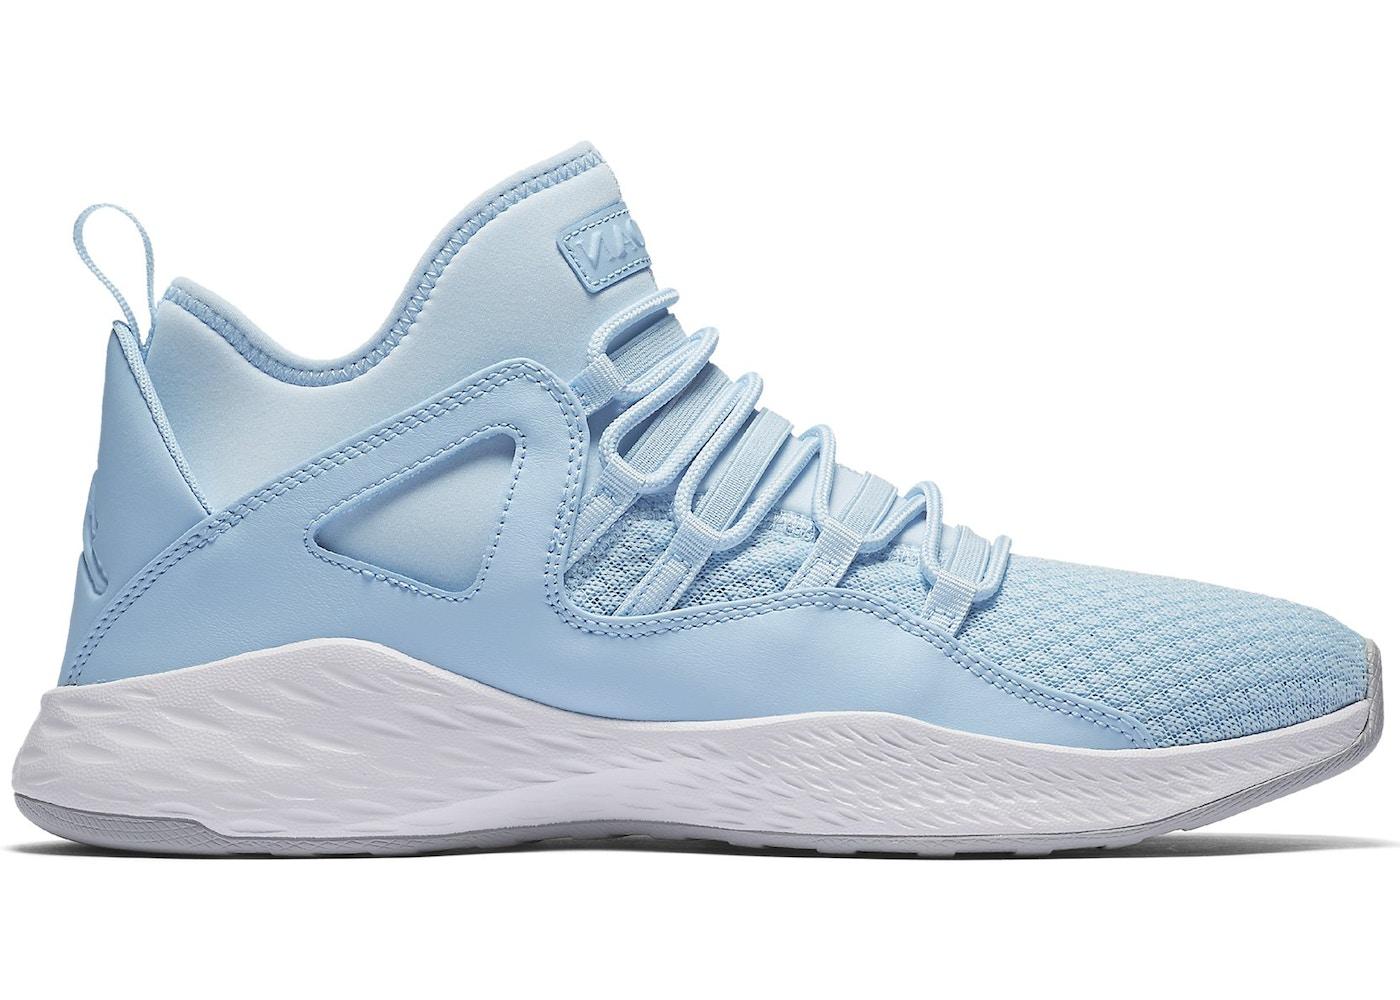 38174c31ae1 Jordan Formula 23 Ice Blue - 881465-406